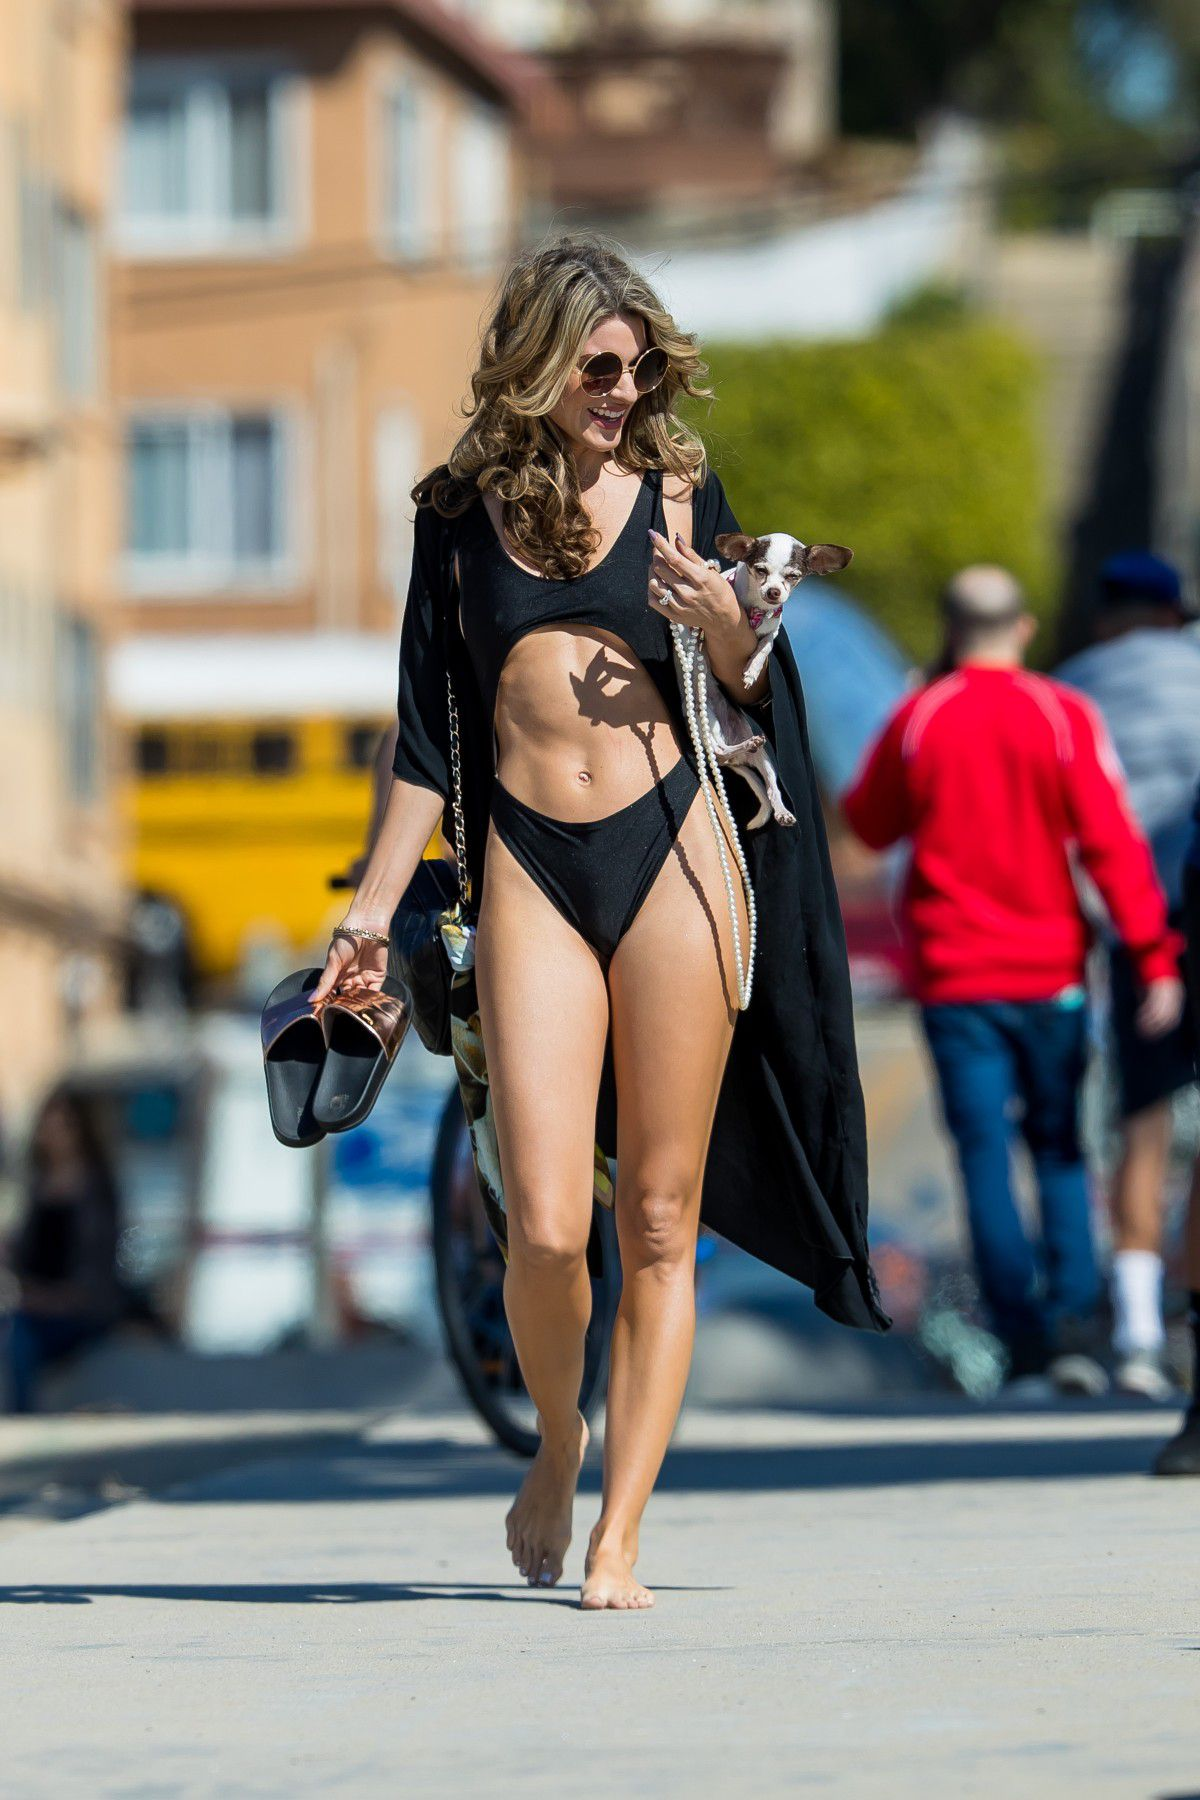 rachel-mccord-cameltoe-in-black-swimsuit-on-the-beach-in-santa-monica-1912